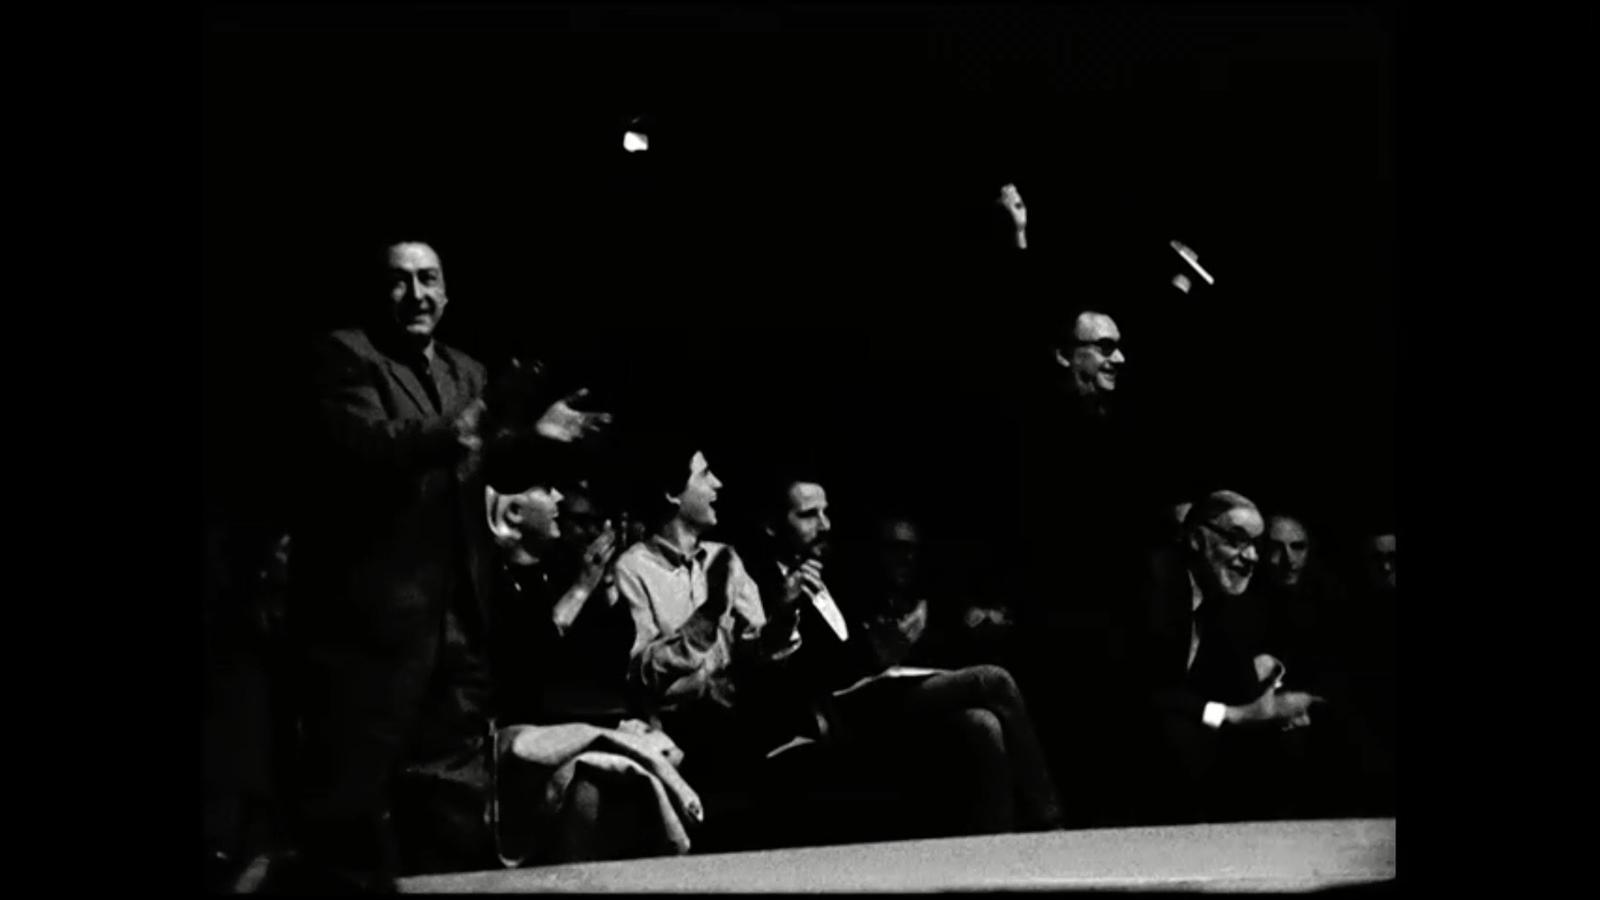 Un fotograma de la pel·lícula de Pere Portabella que es va rodar de manera clandestina al 'Price dels poetes' del 1970